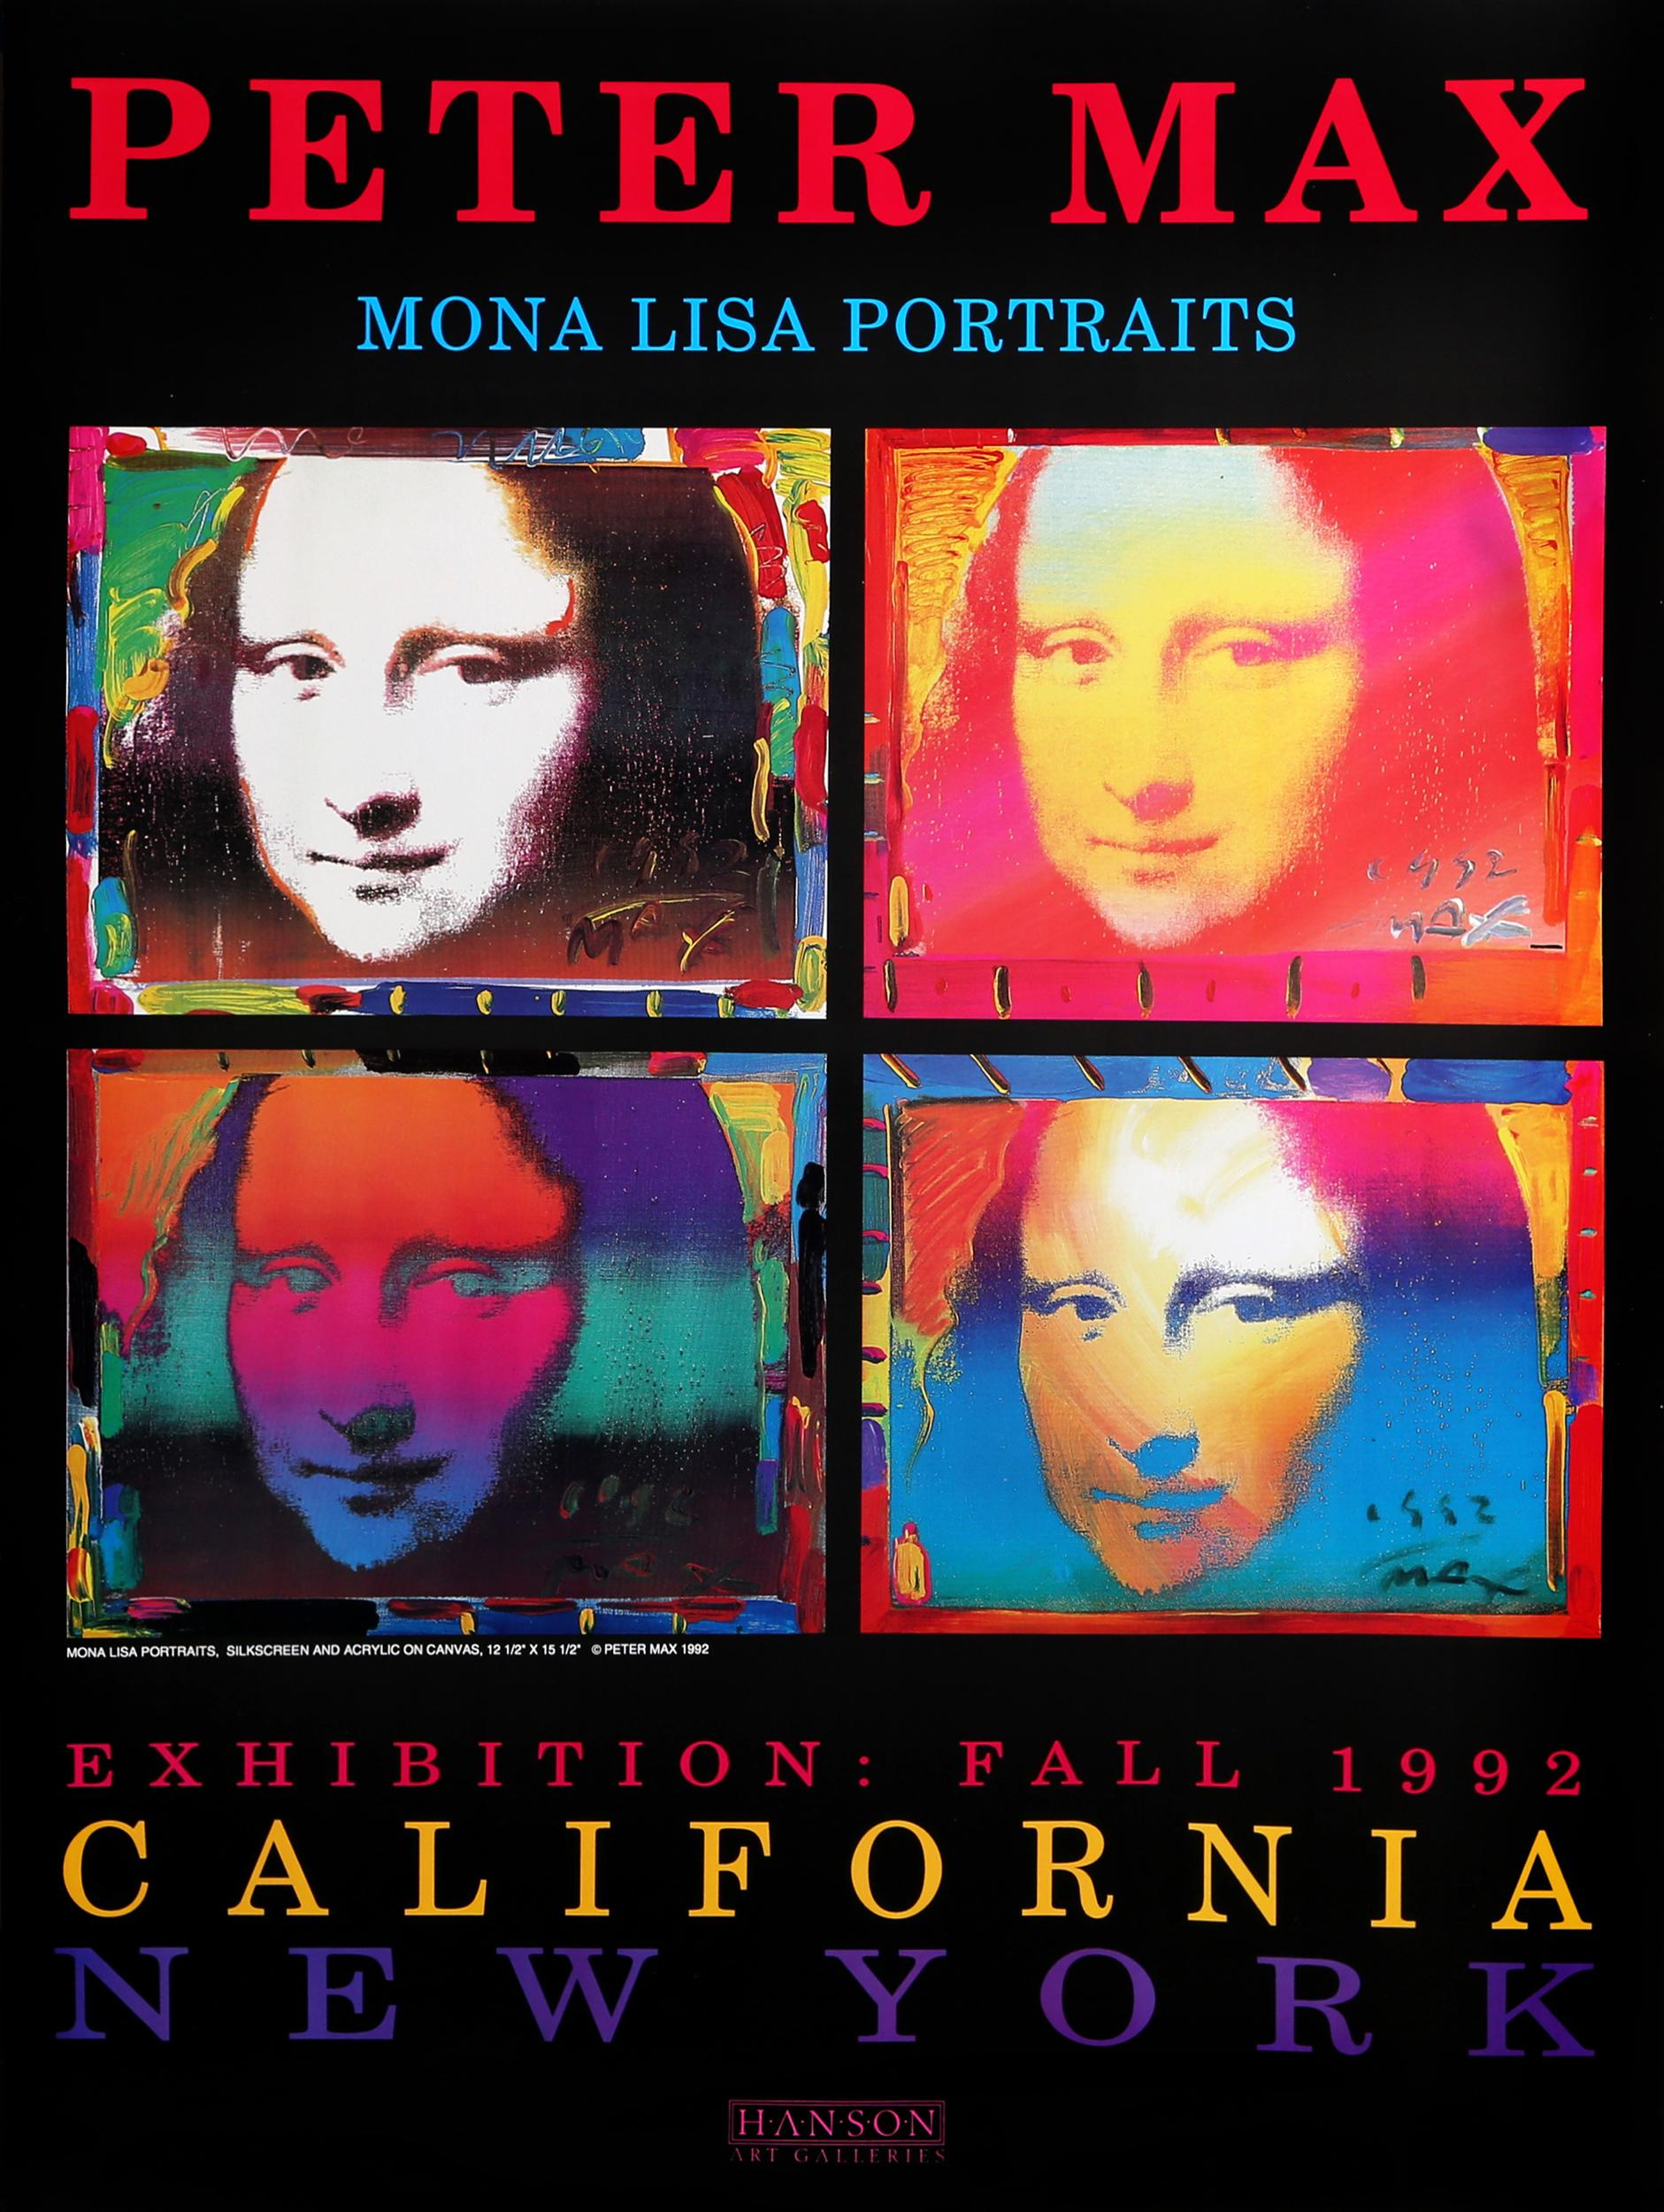 Peter Max, Mona Lisa Portraits, Poster